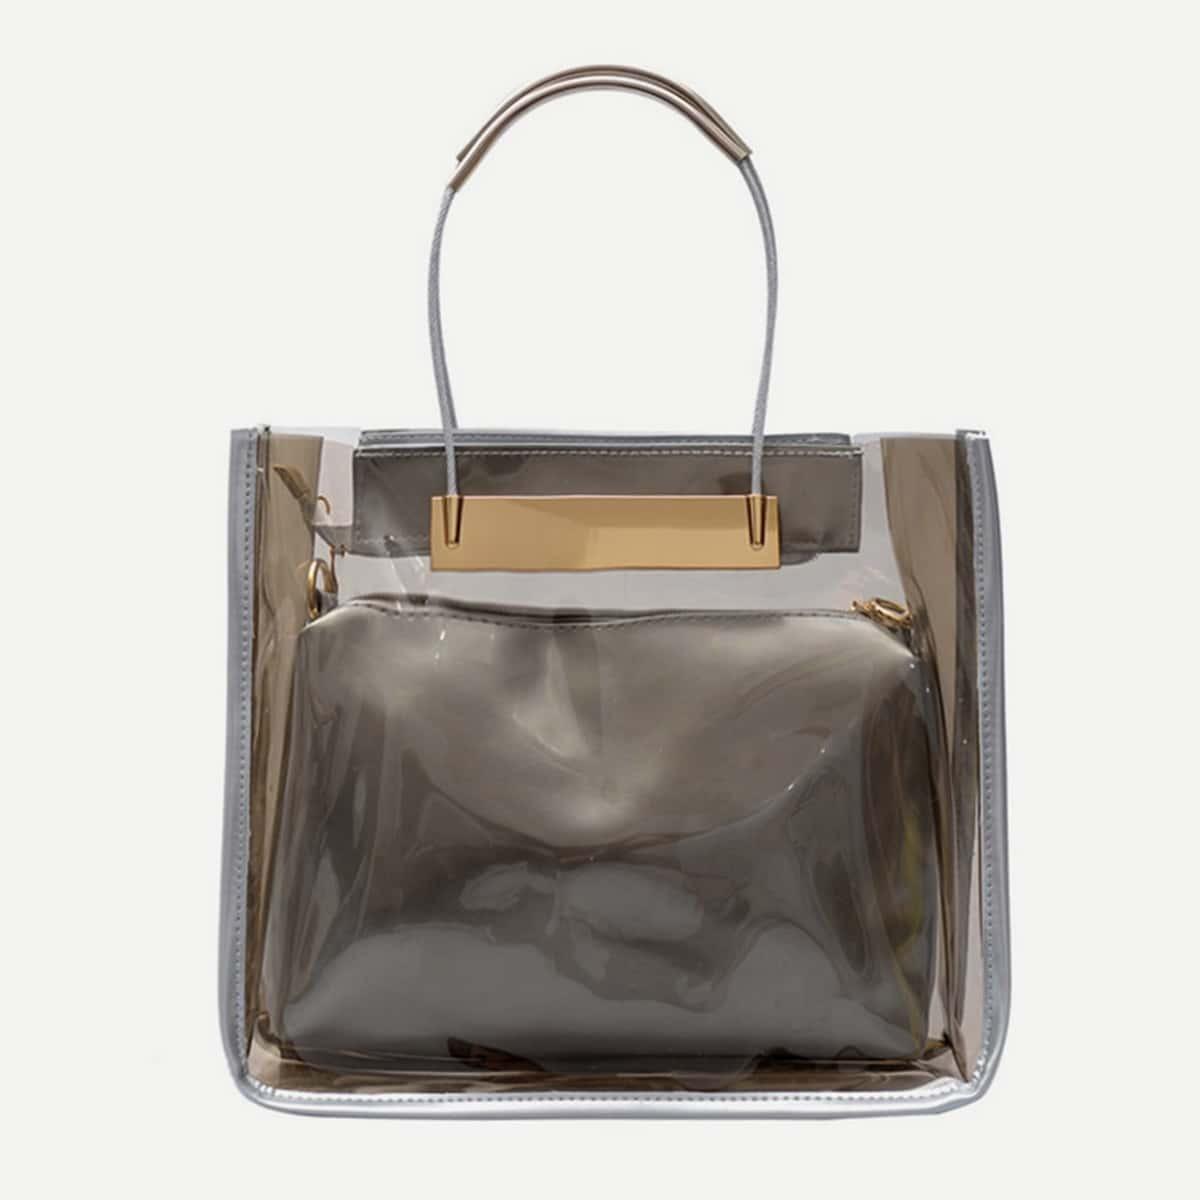 - Transparent Handbag With Clutch 2pcs